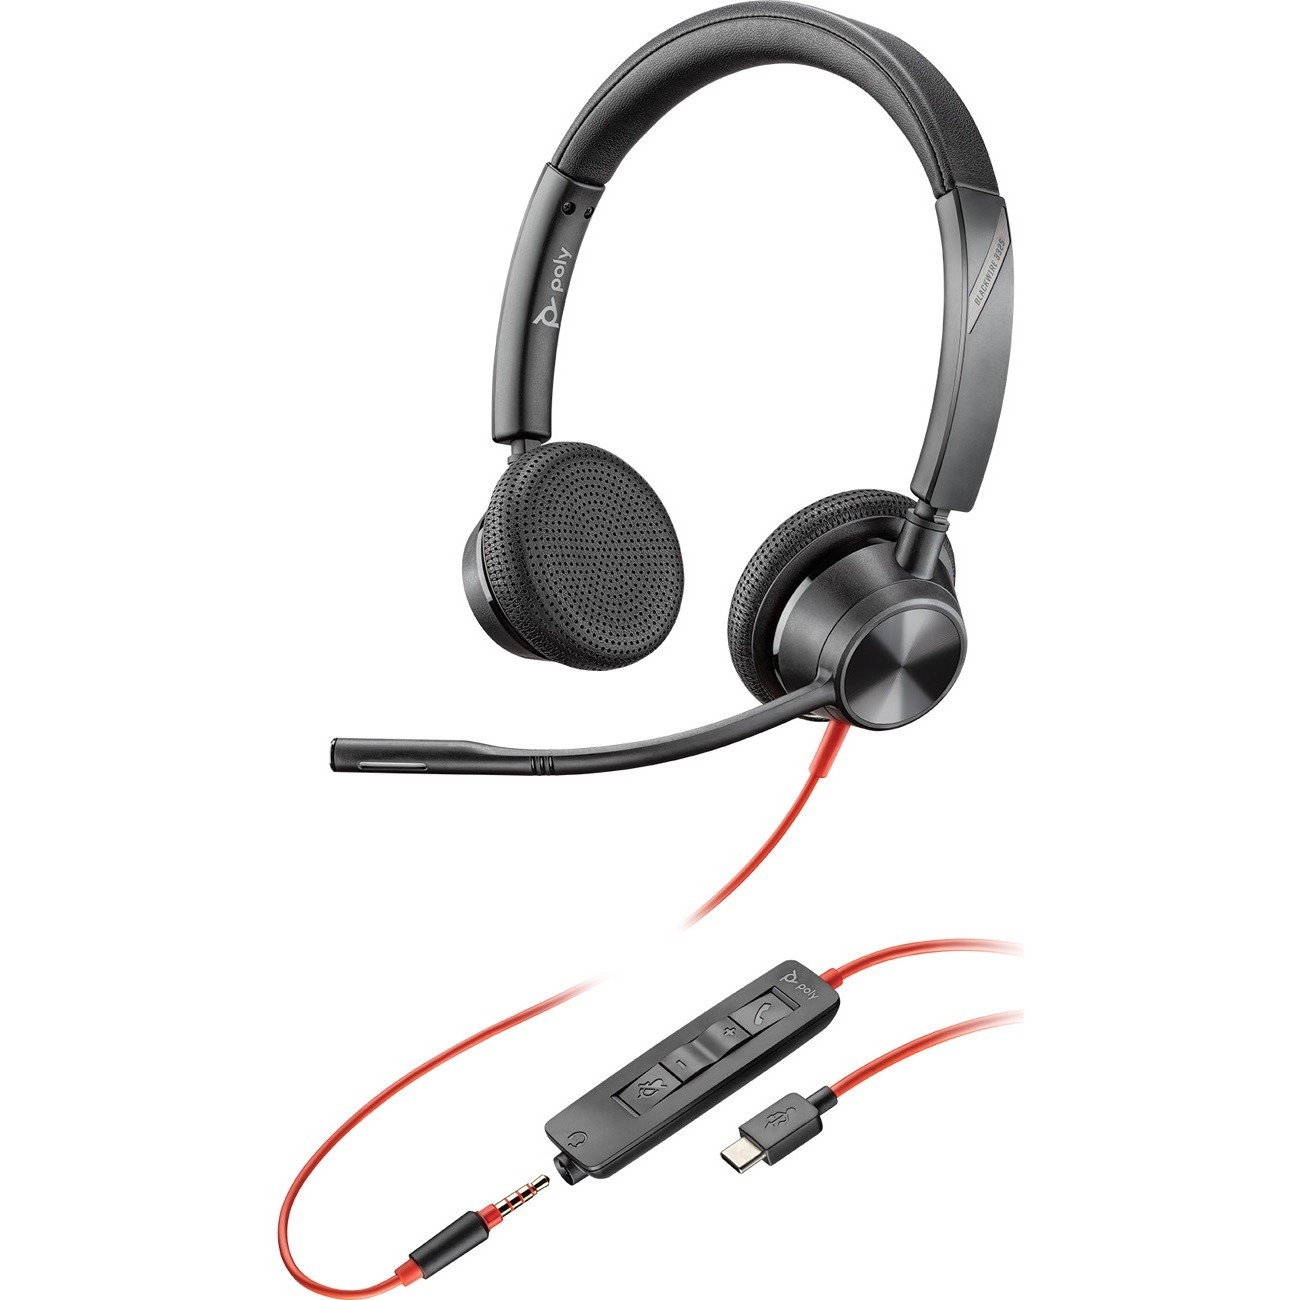 Plantronics Blackwire 3325 Microsoft USB-C Headset_subImage_1